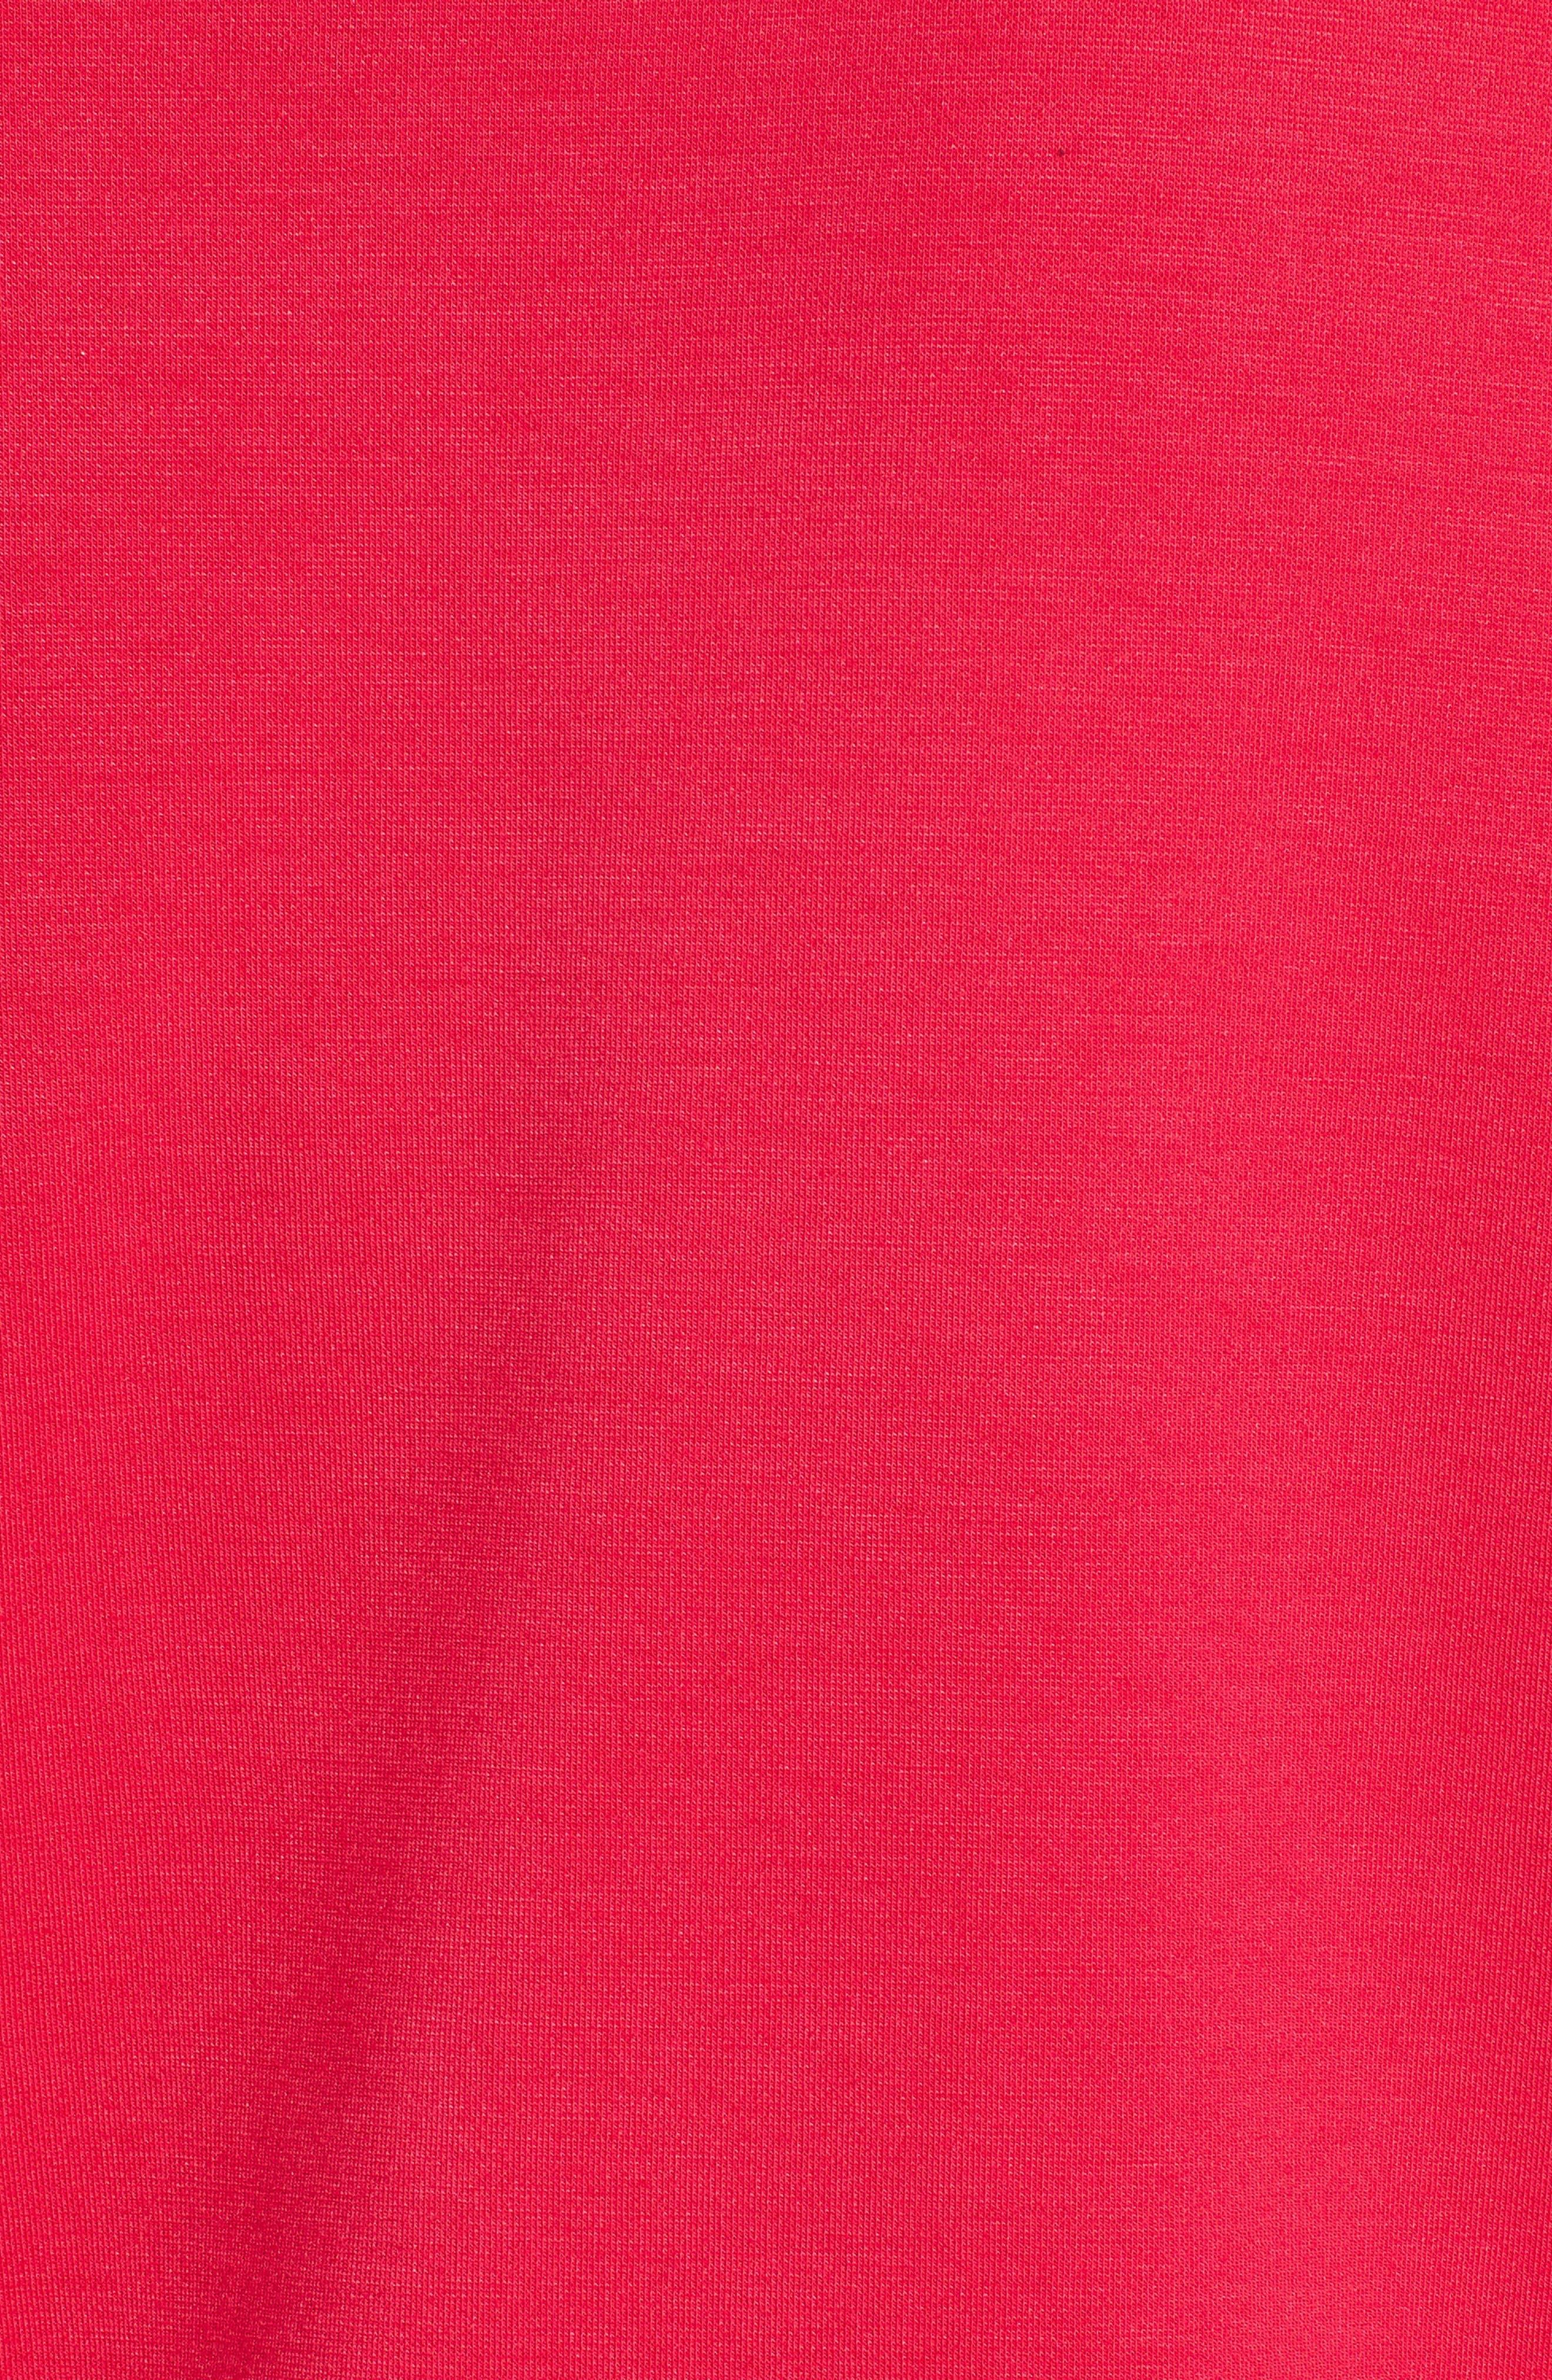 One-Shoulder Knit Tee,                             Alternate thumbnail 6, color,                             Azalea